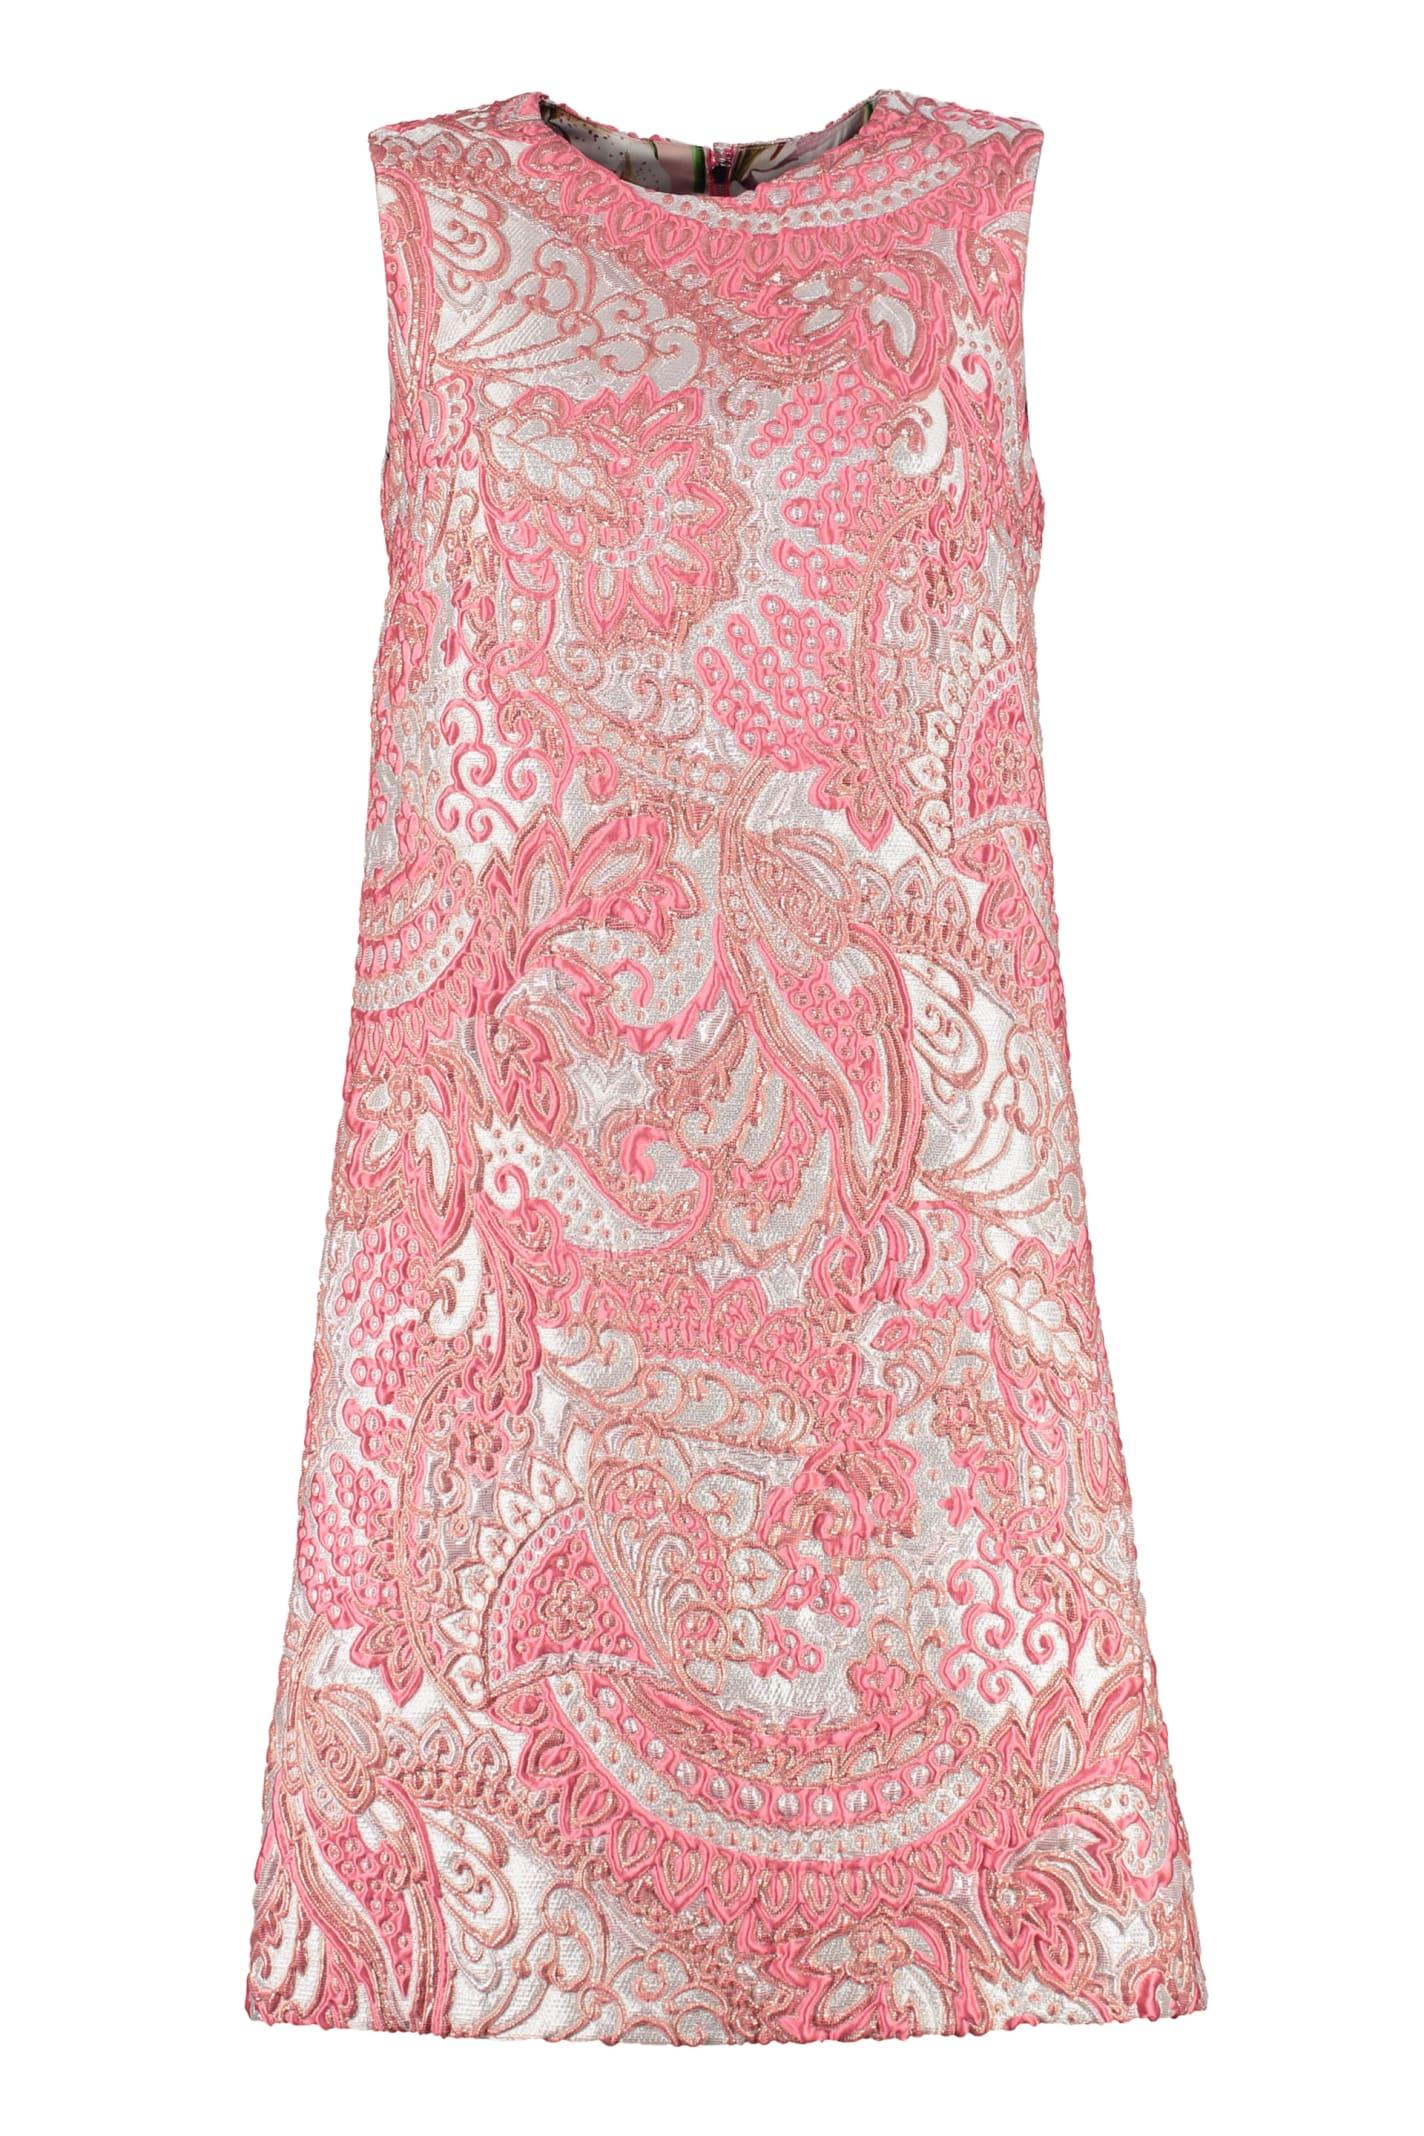 Dolce & Gabbana Lamé Jacquard Mini Dress